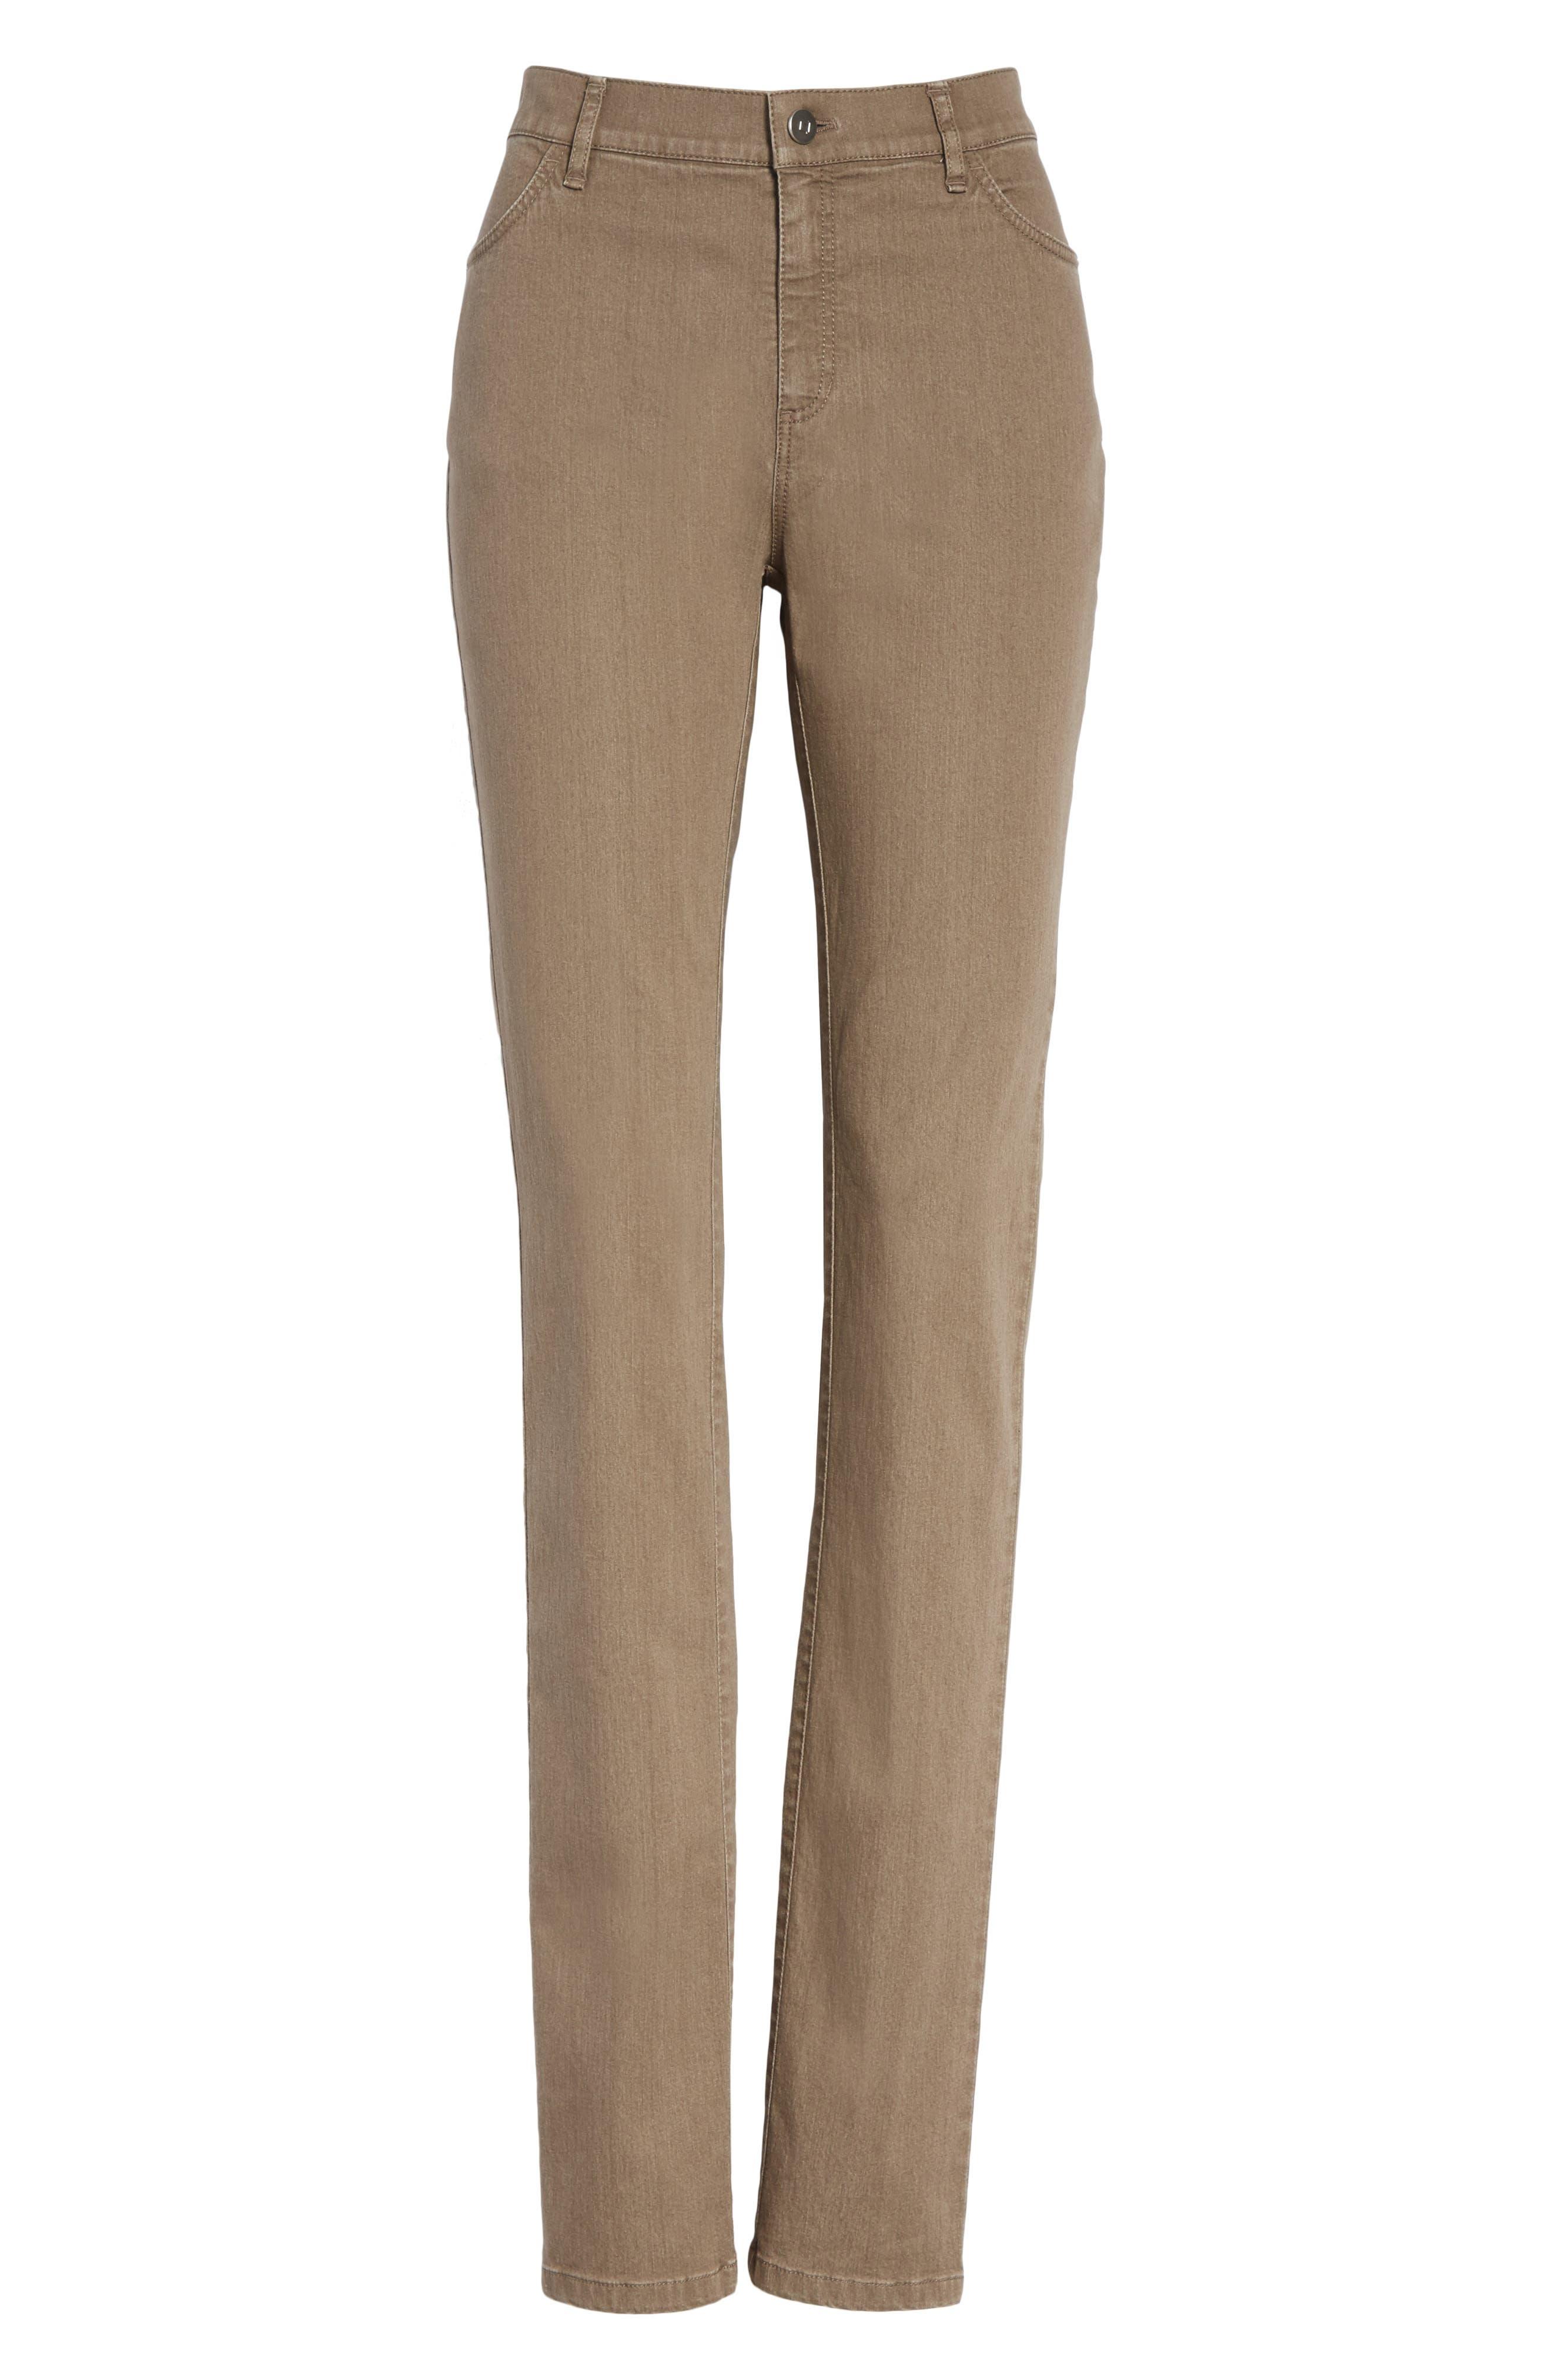 'Primo Denim' Curvy Fit Slim Leg Jeans,                             Alternate thumbnail 6, color,                             Tumbleweed